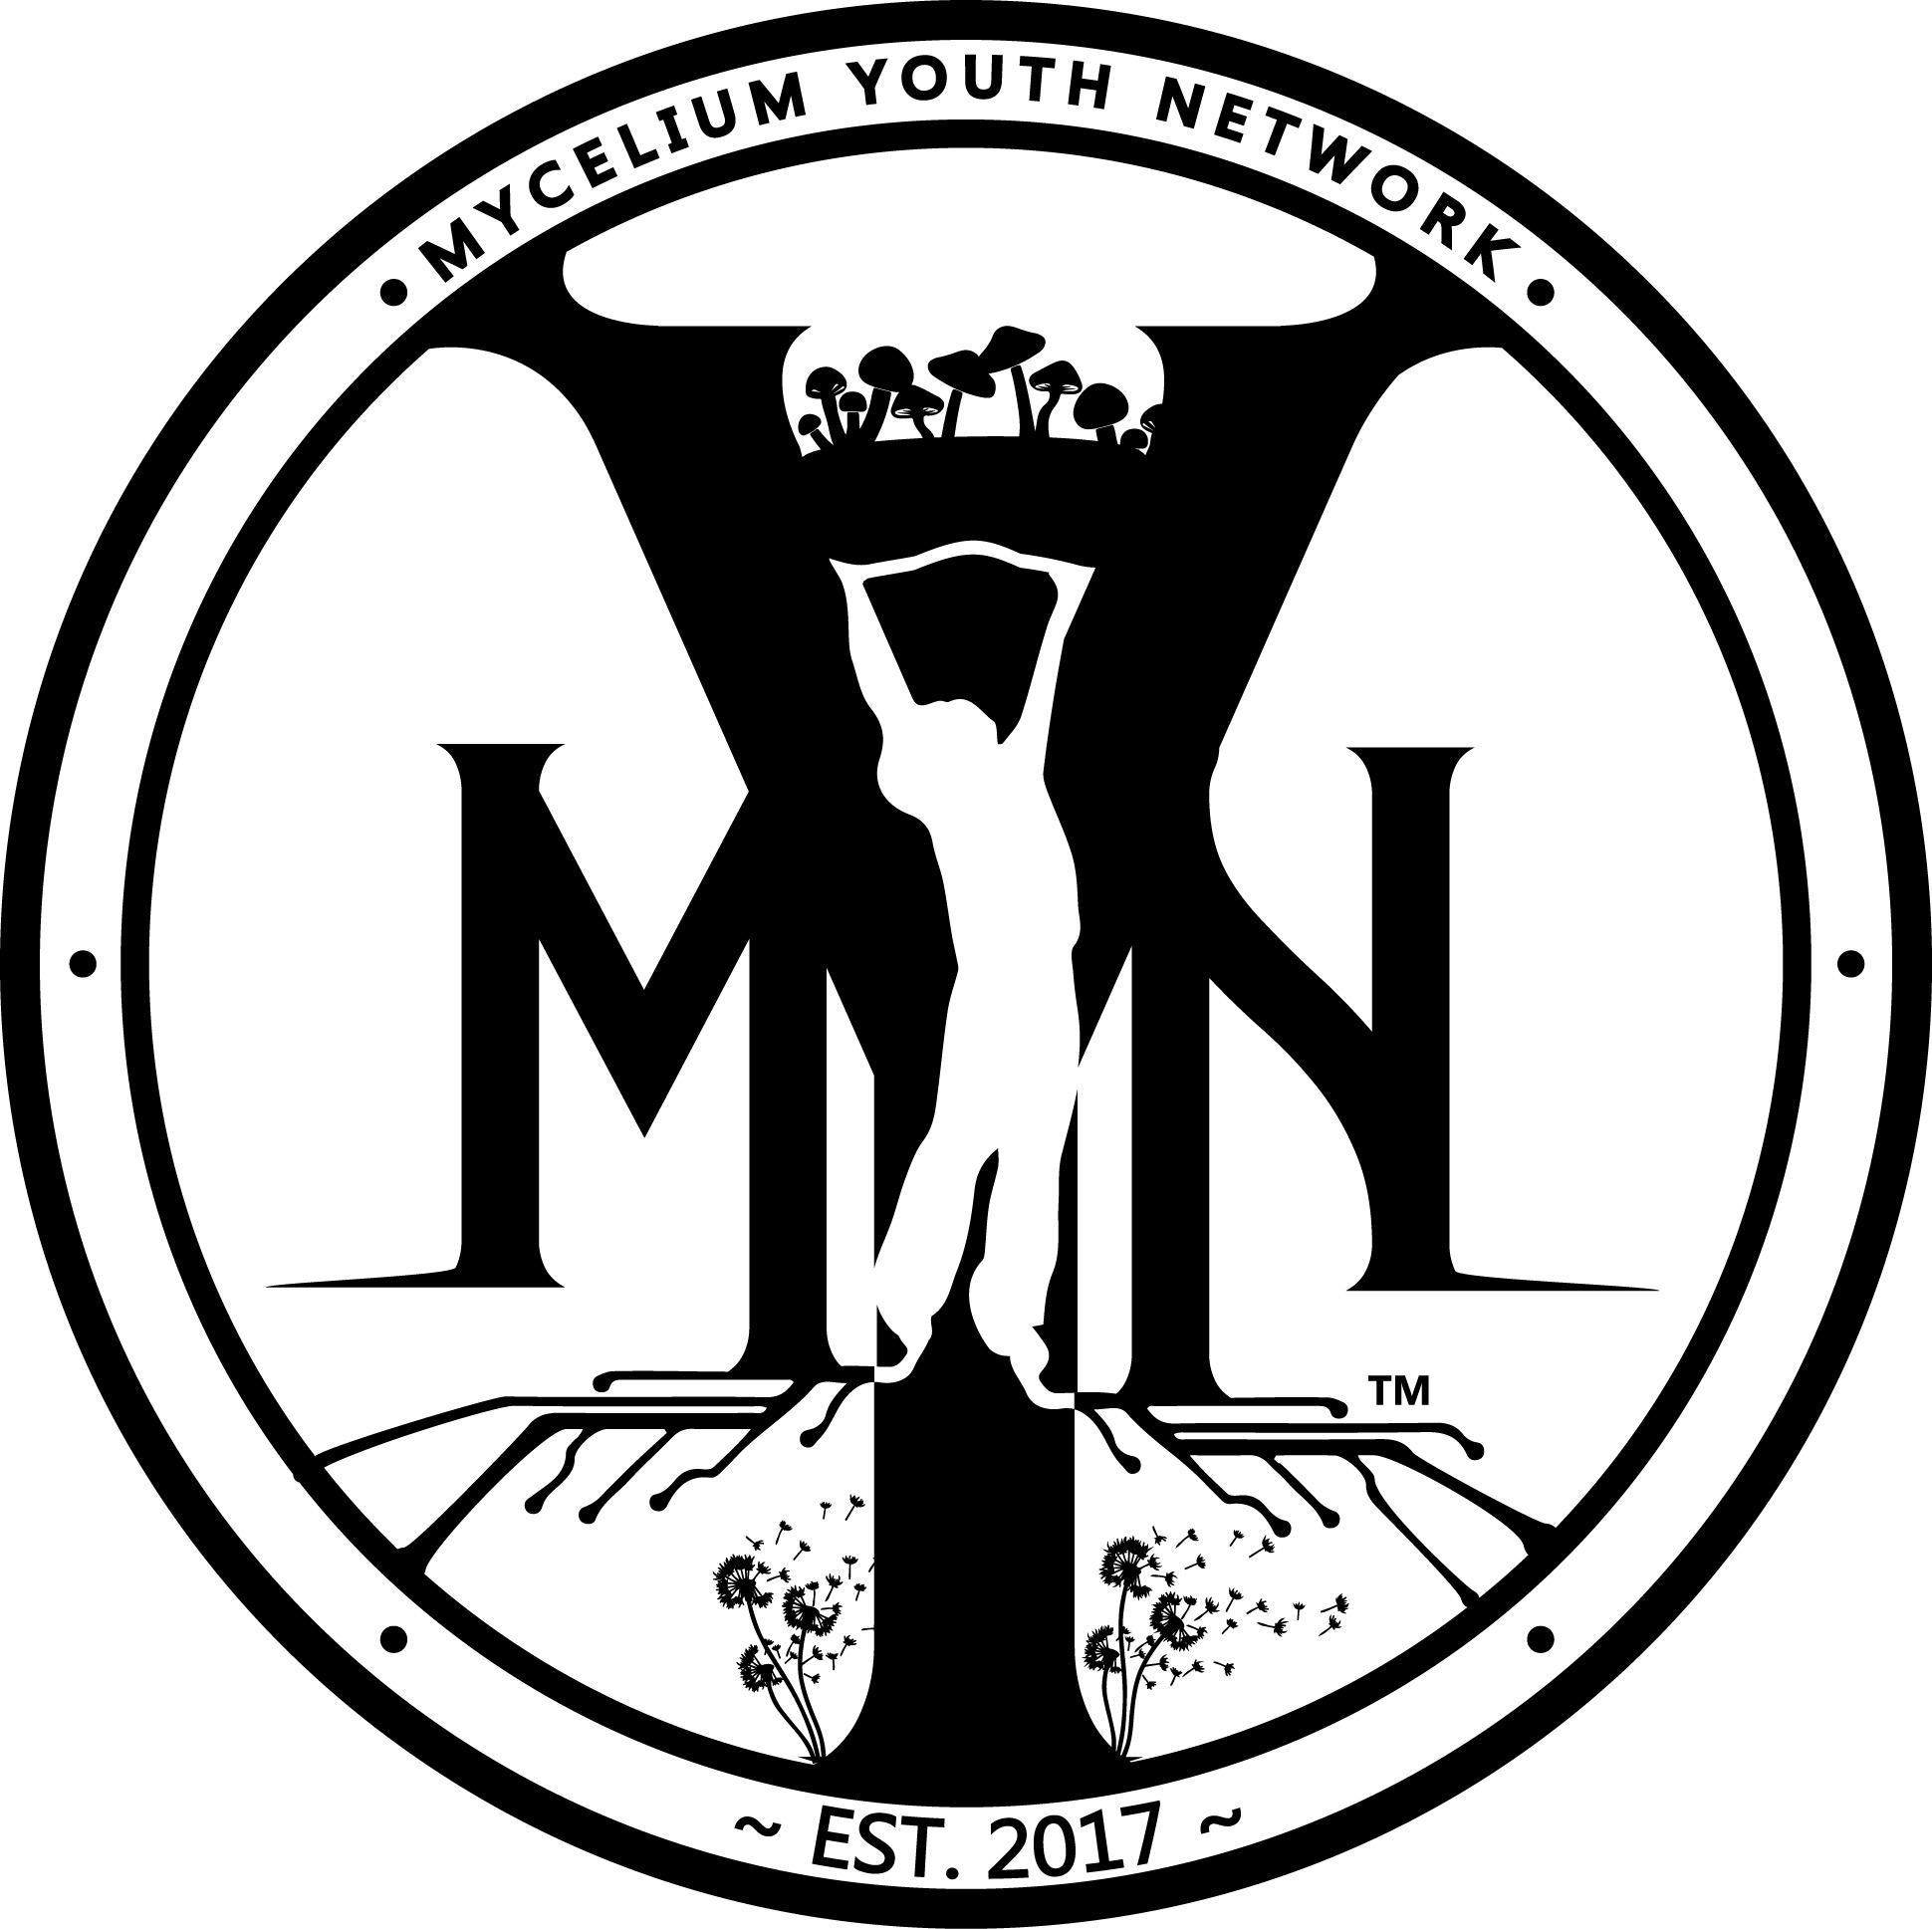 Mycelium Youth Network